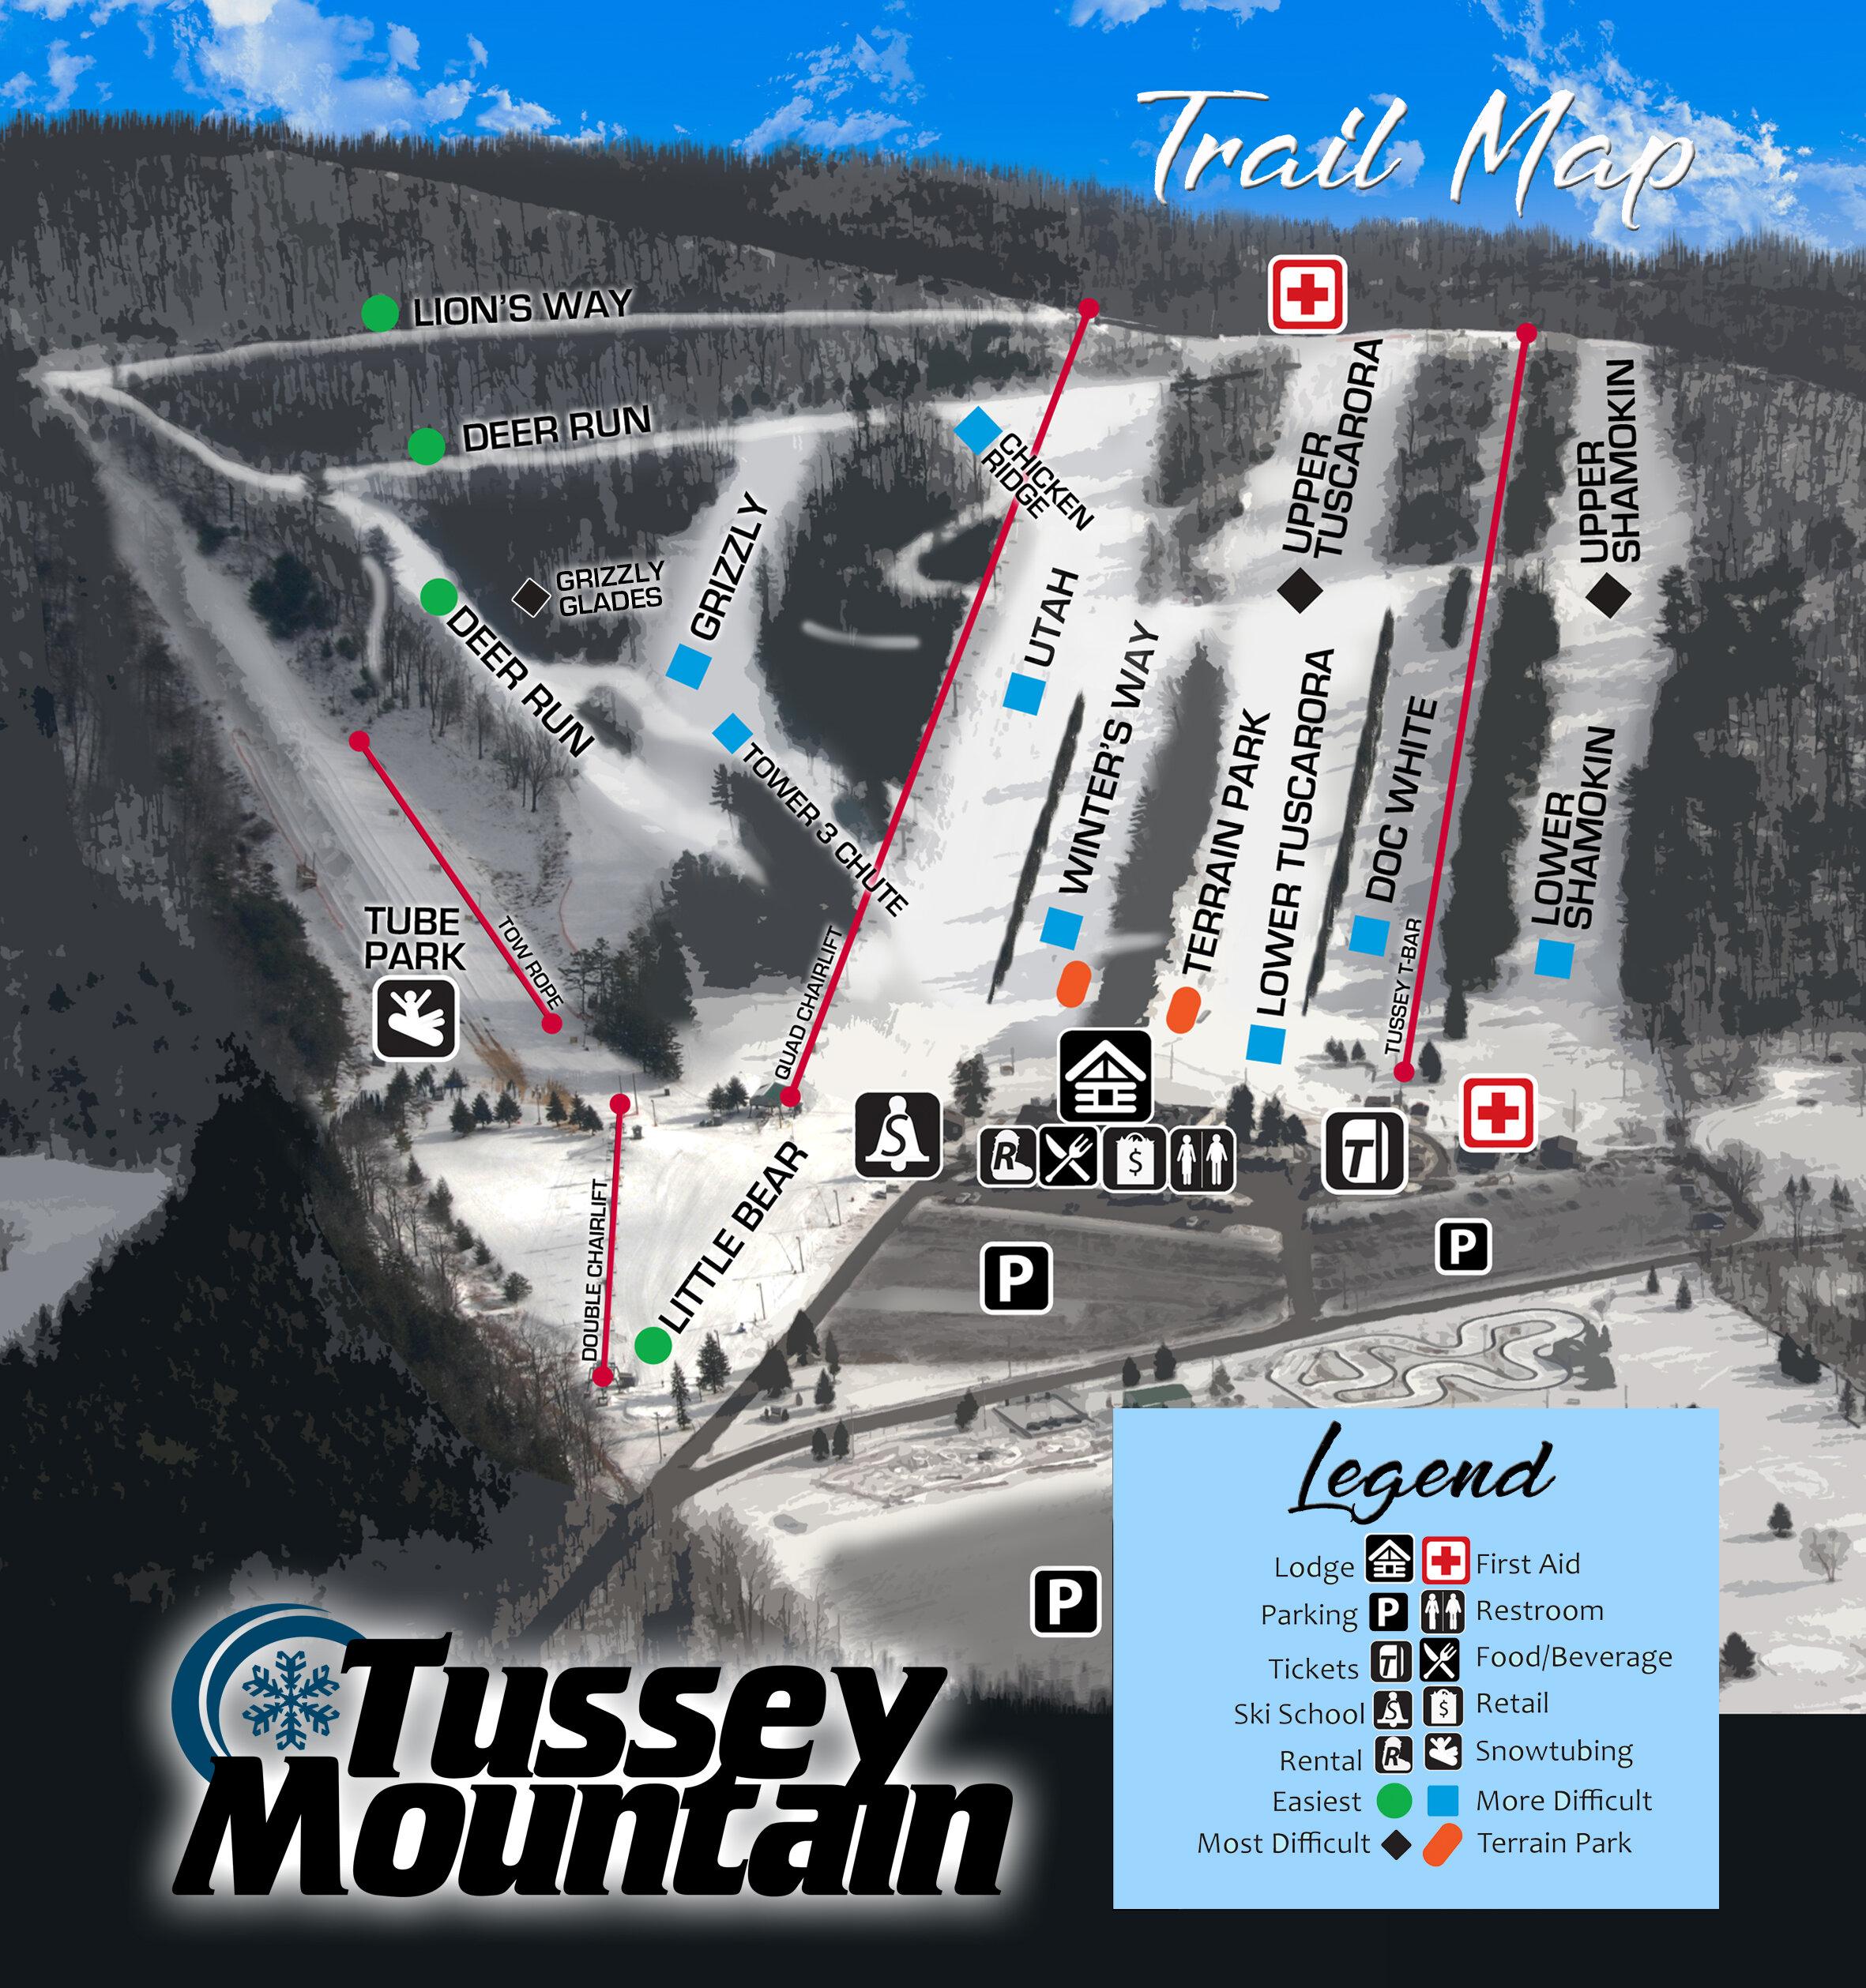 trailmap-18.jpg